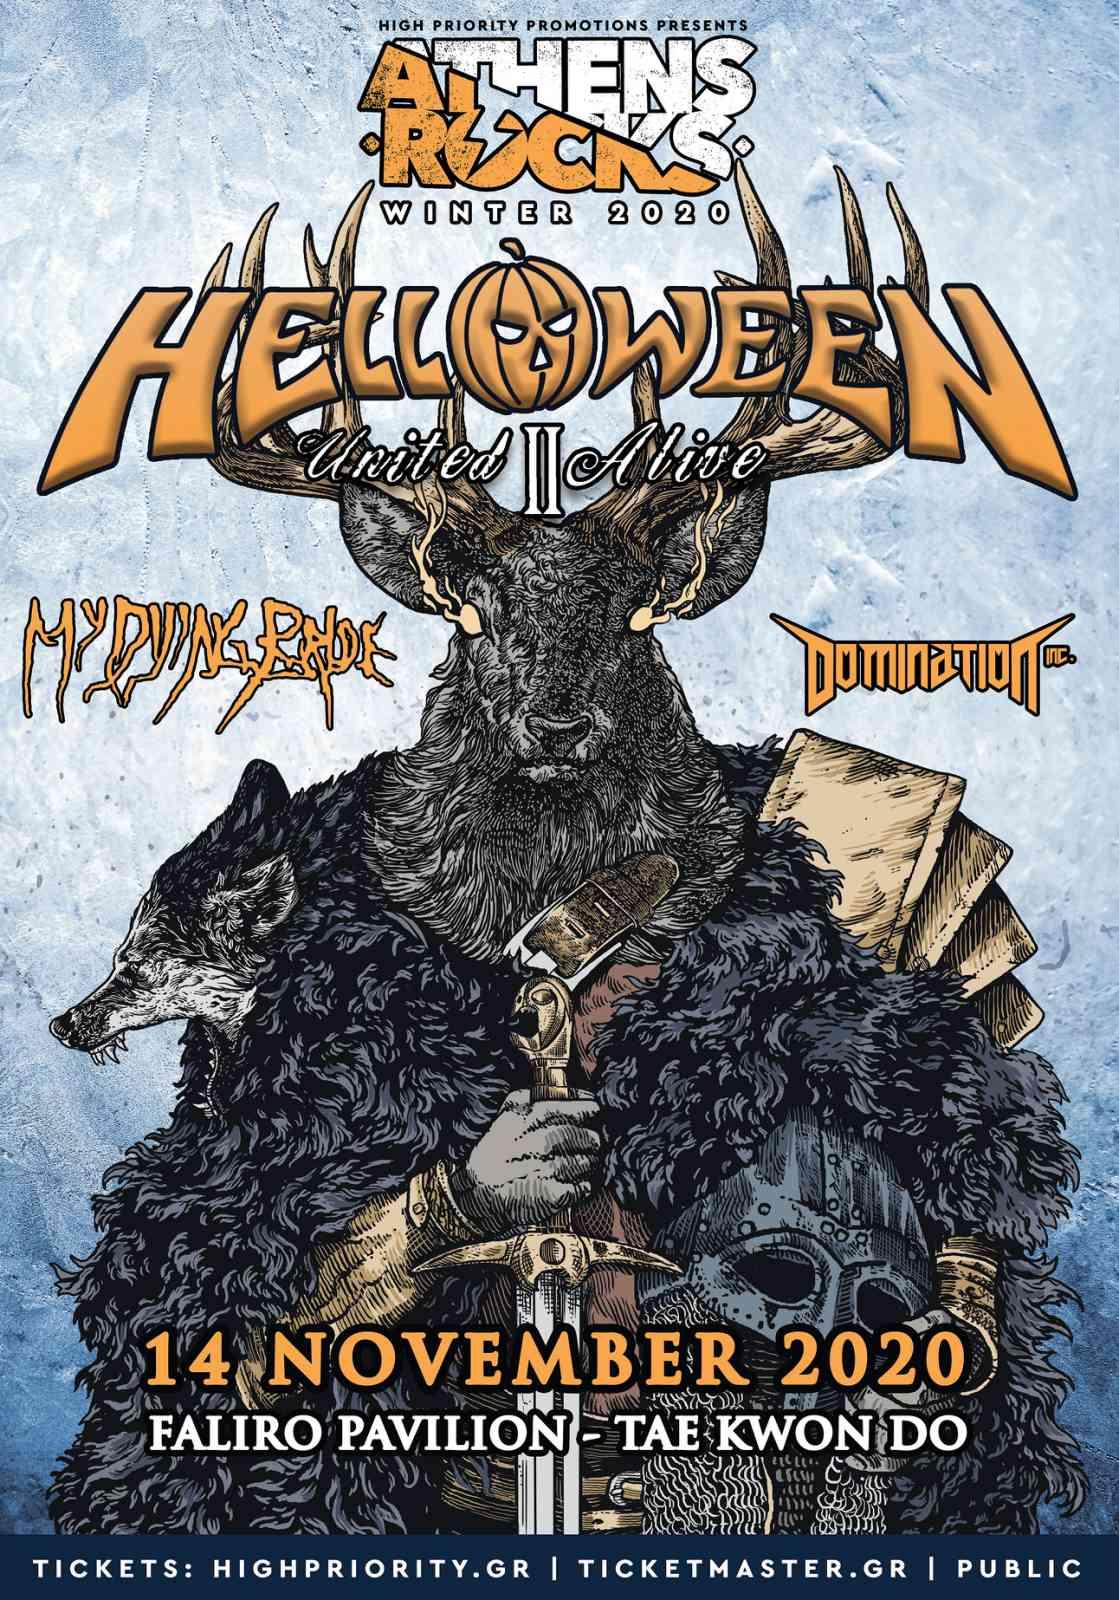 AthensRock Winter Helloween 14 Nov Poster